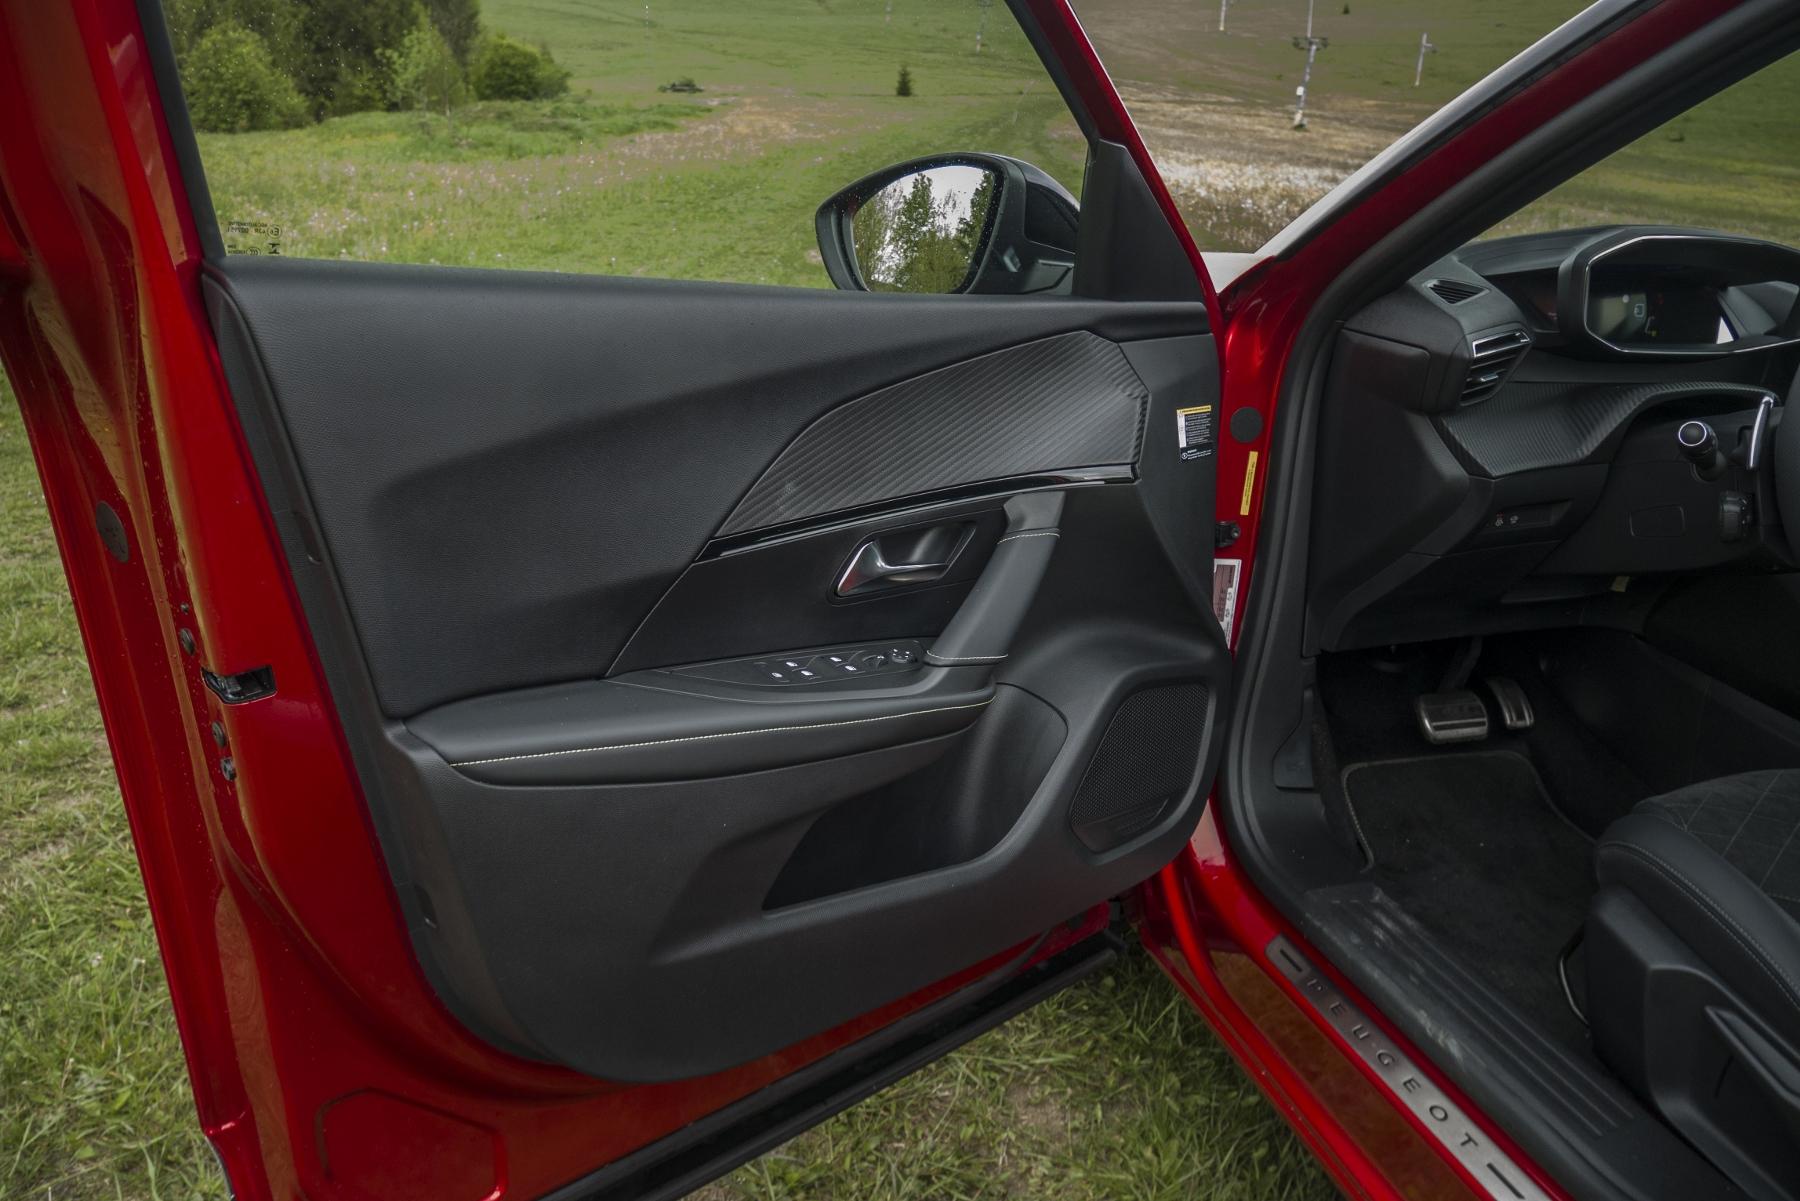 Test: Peugeot 2008 GT ohuruje silným trojvalcom a dobrou prevodovkou zUztCG7SQW peugeot-2008-54